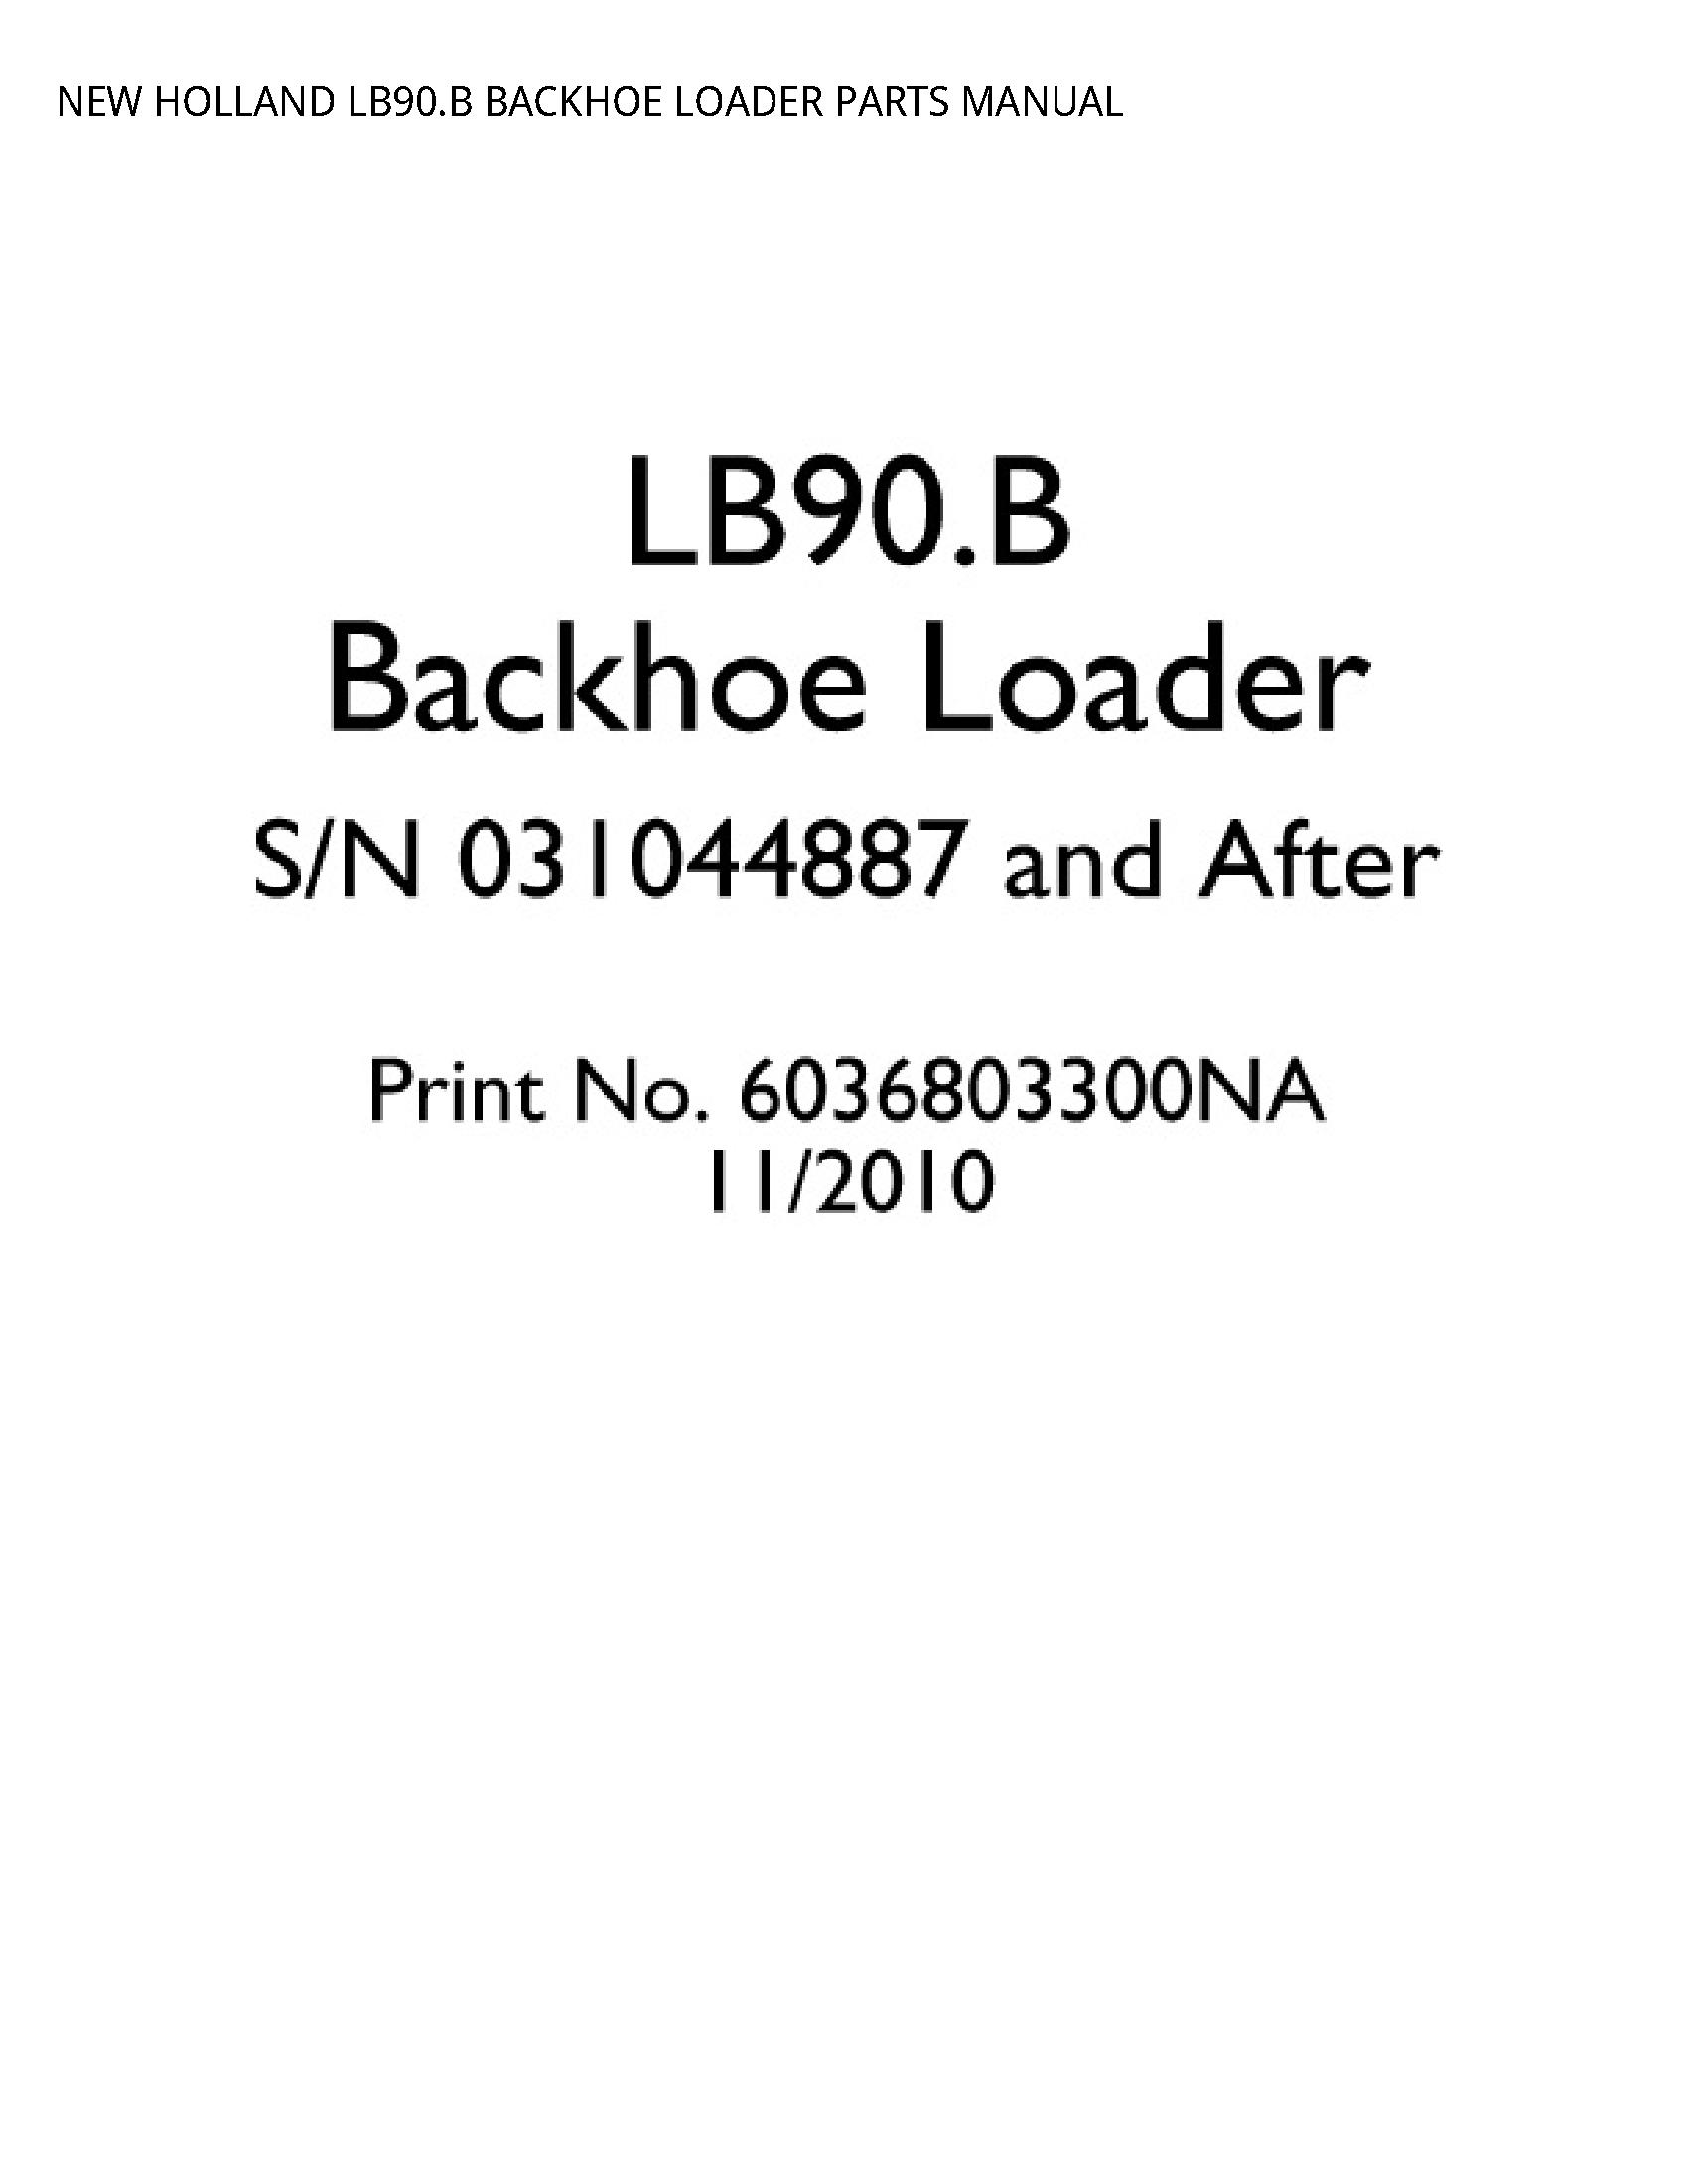 New Holland LB90.B BACKHOE LOADER PARTS manual